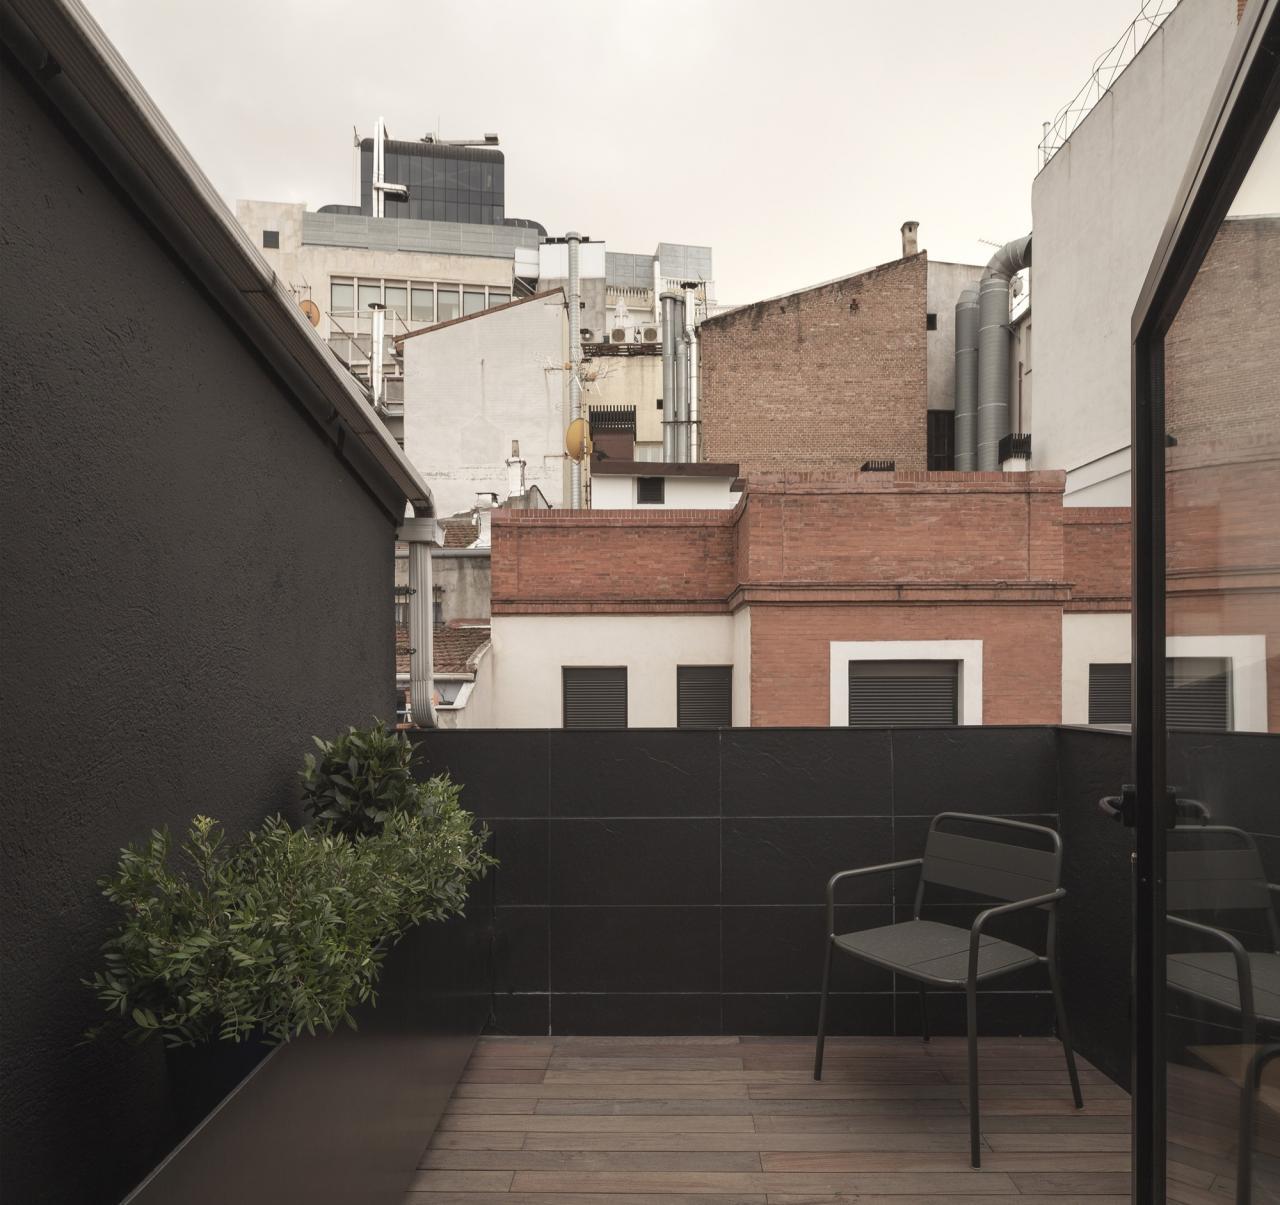 nhà tối giản ana apartment house elledecoration vn